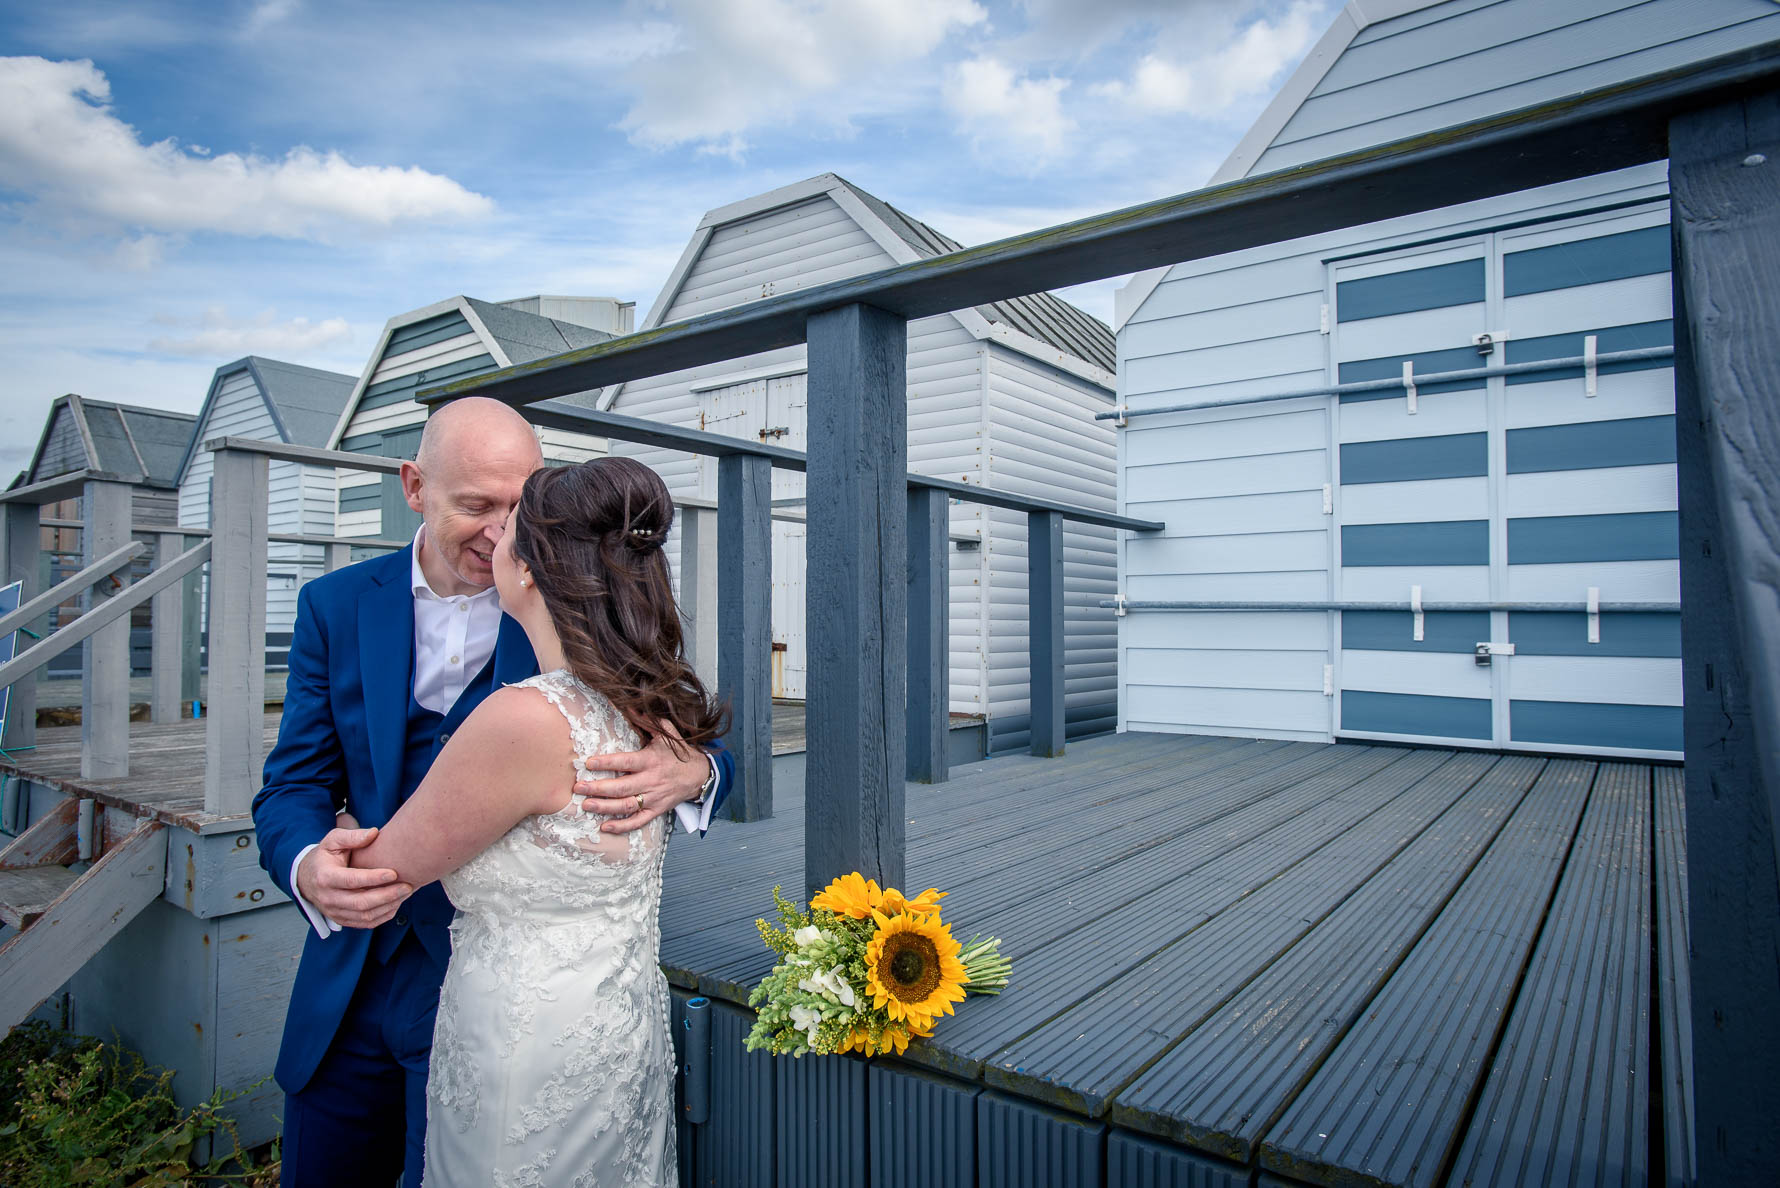 Wedding Photography at East Quay Venue-58.jpg